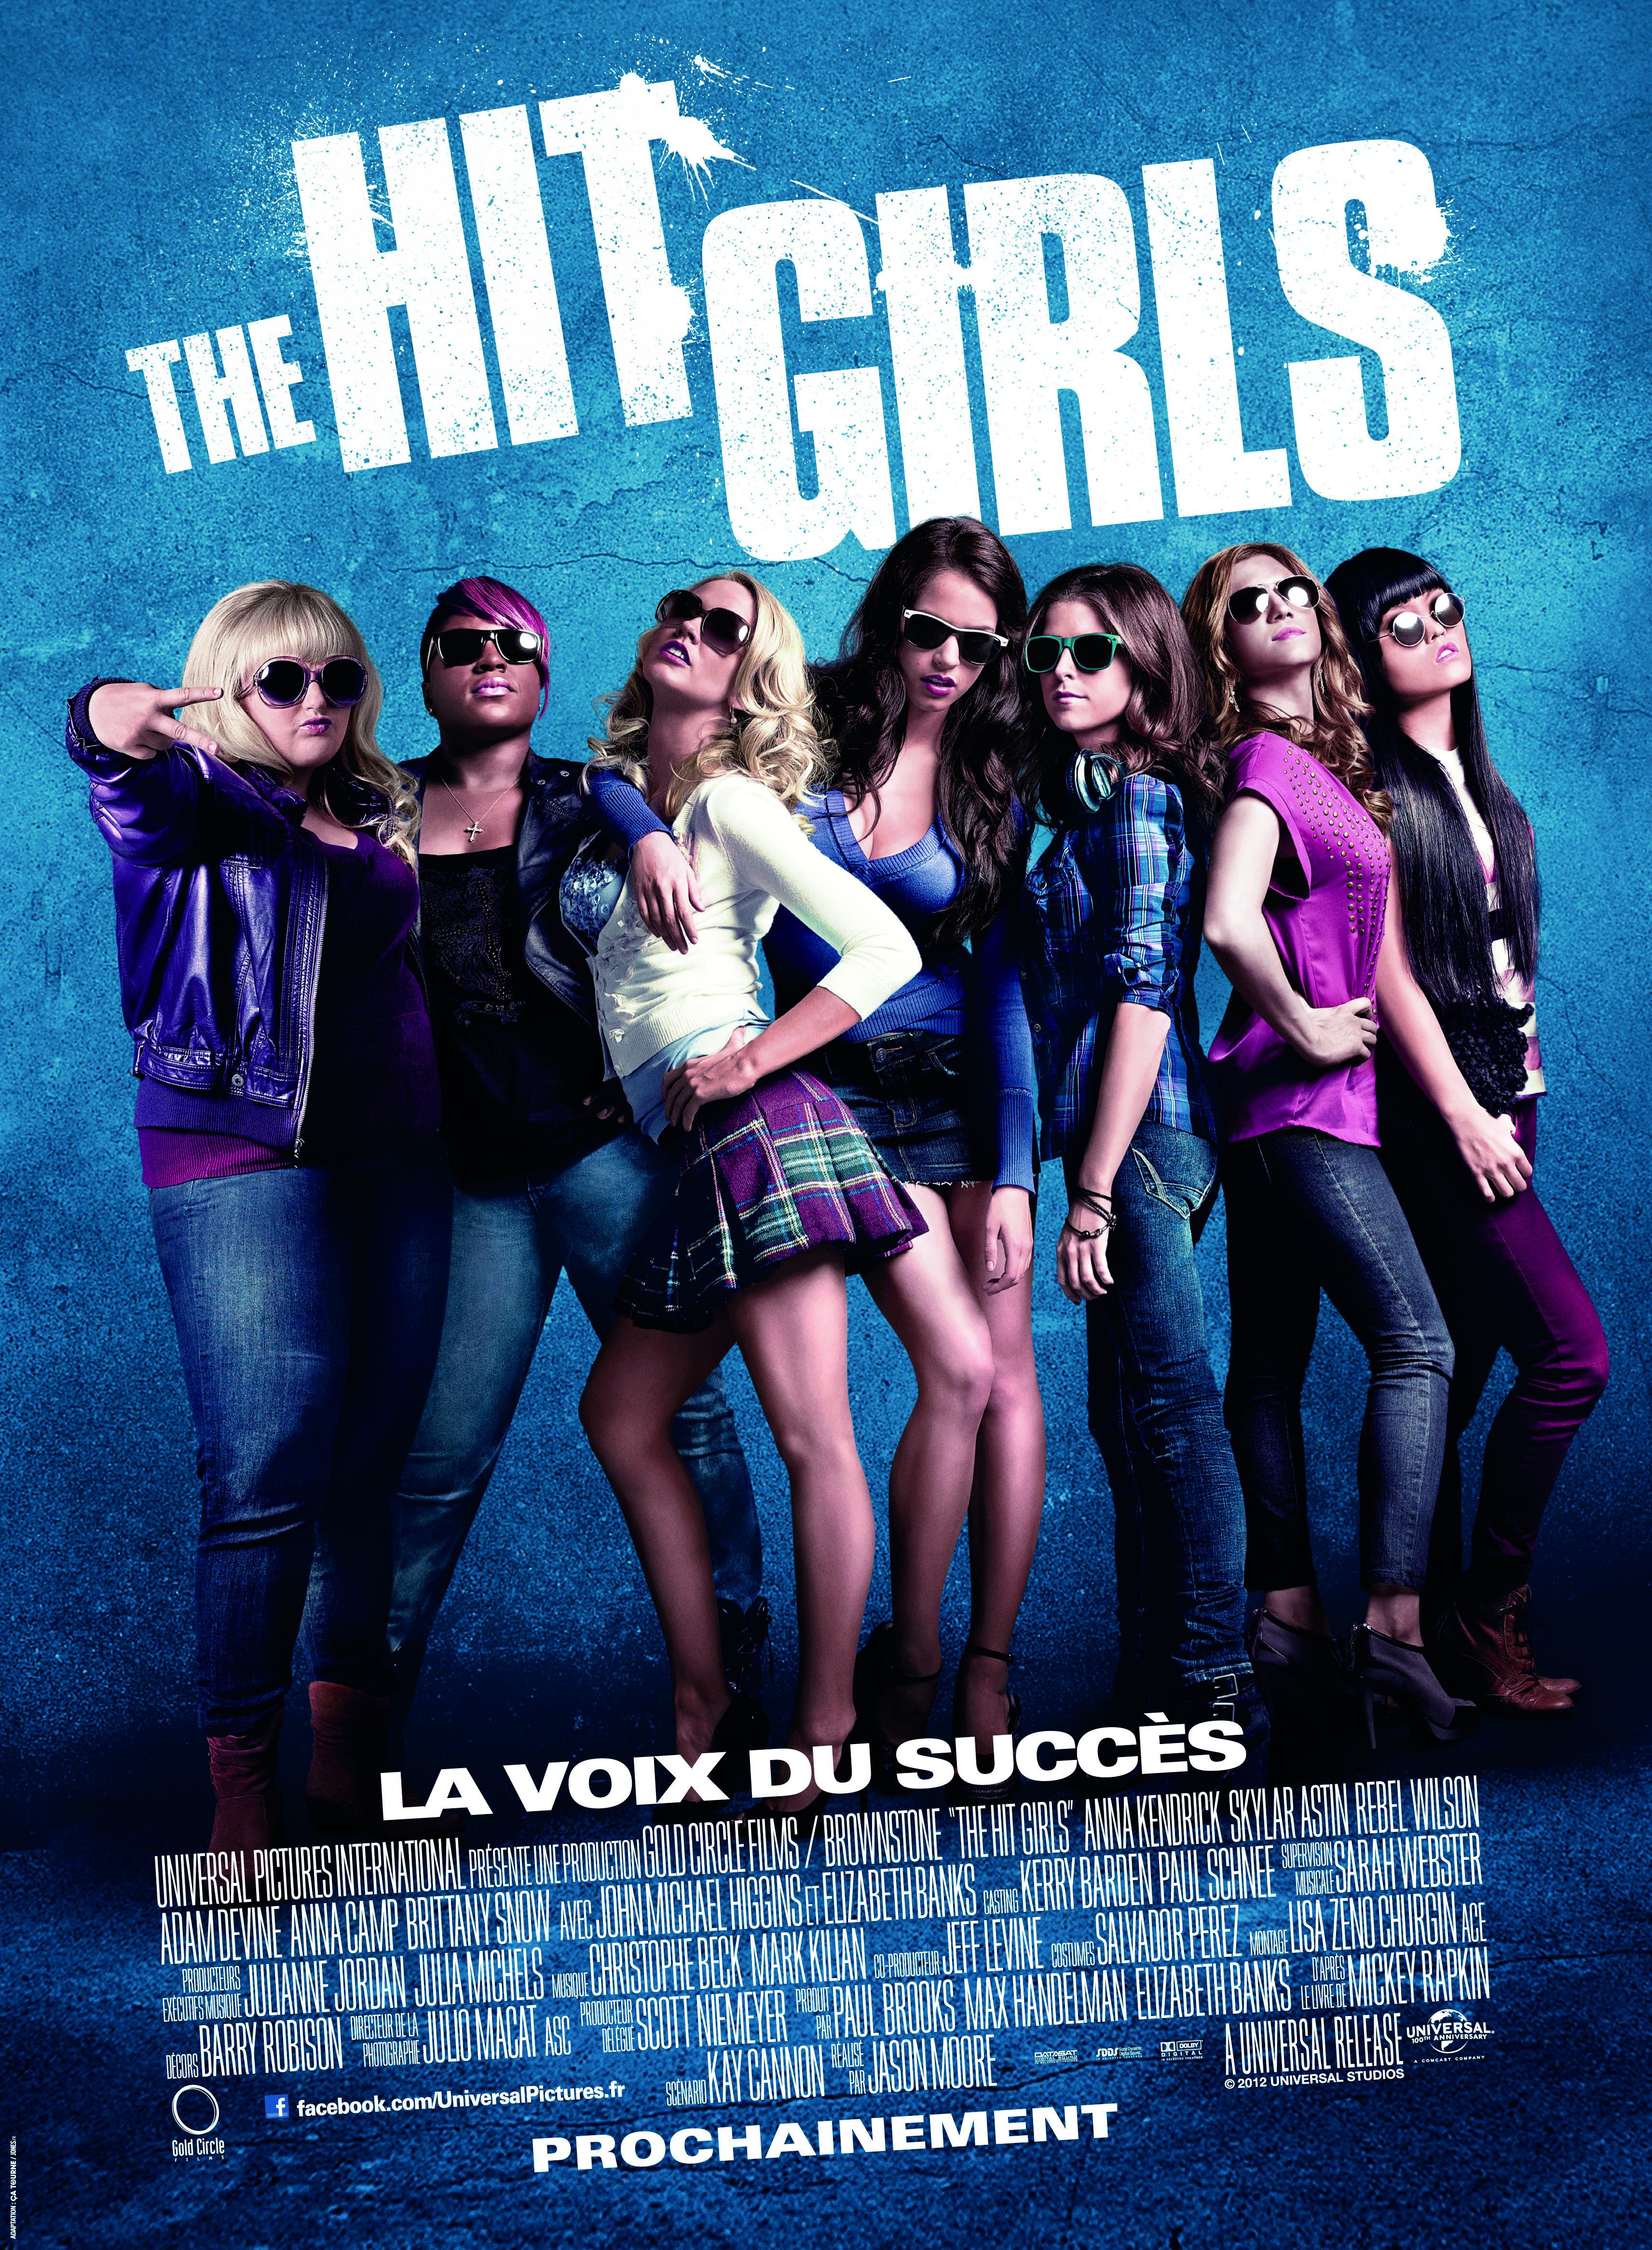 THE-HIT-GIRLS-HD